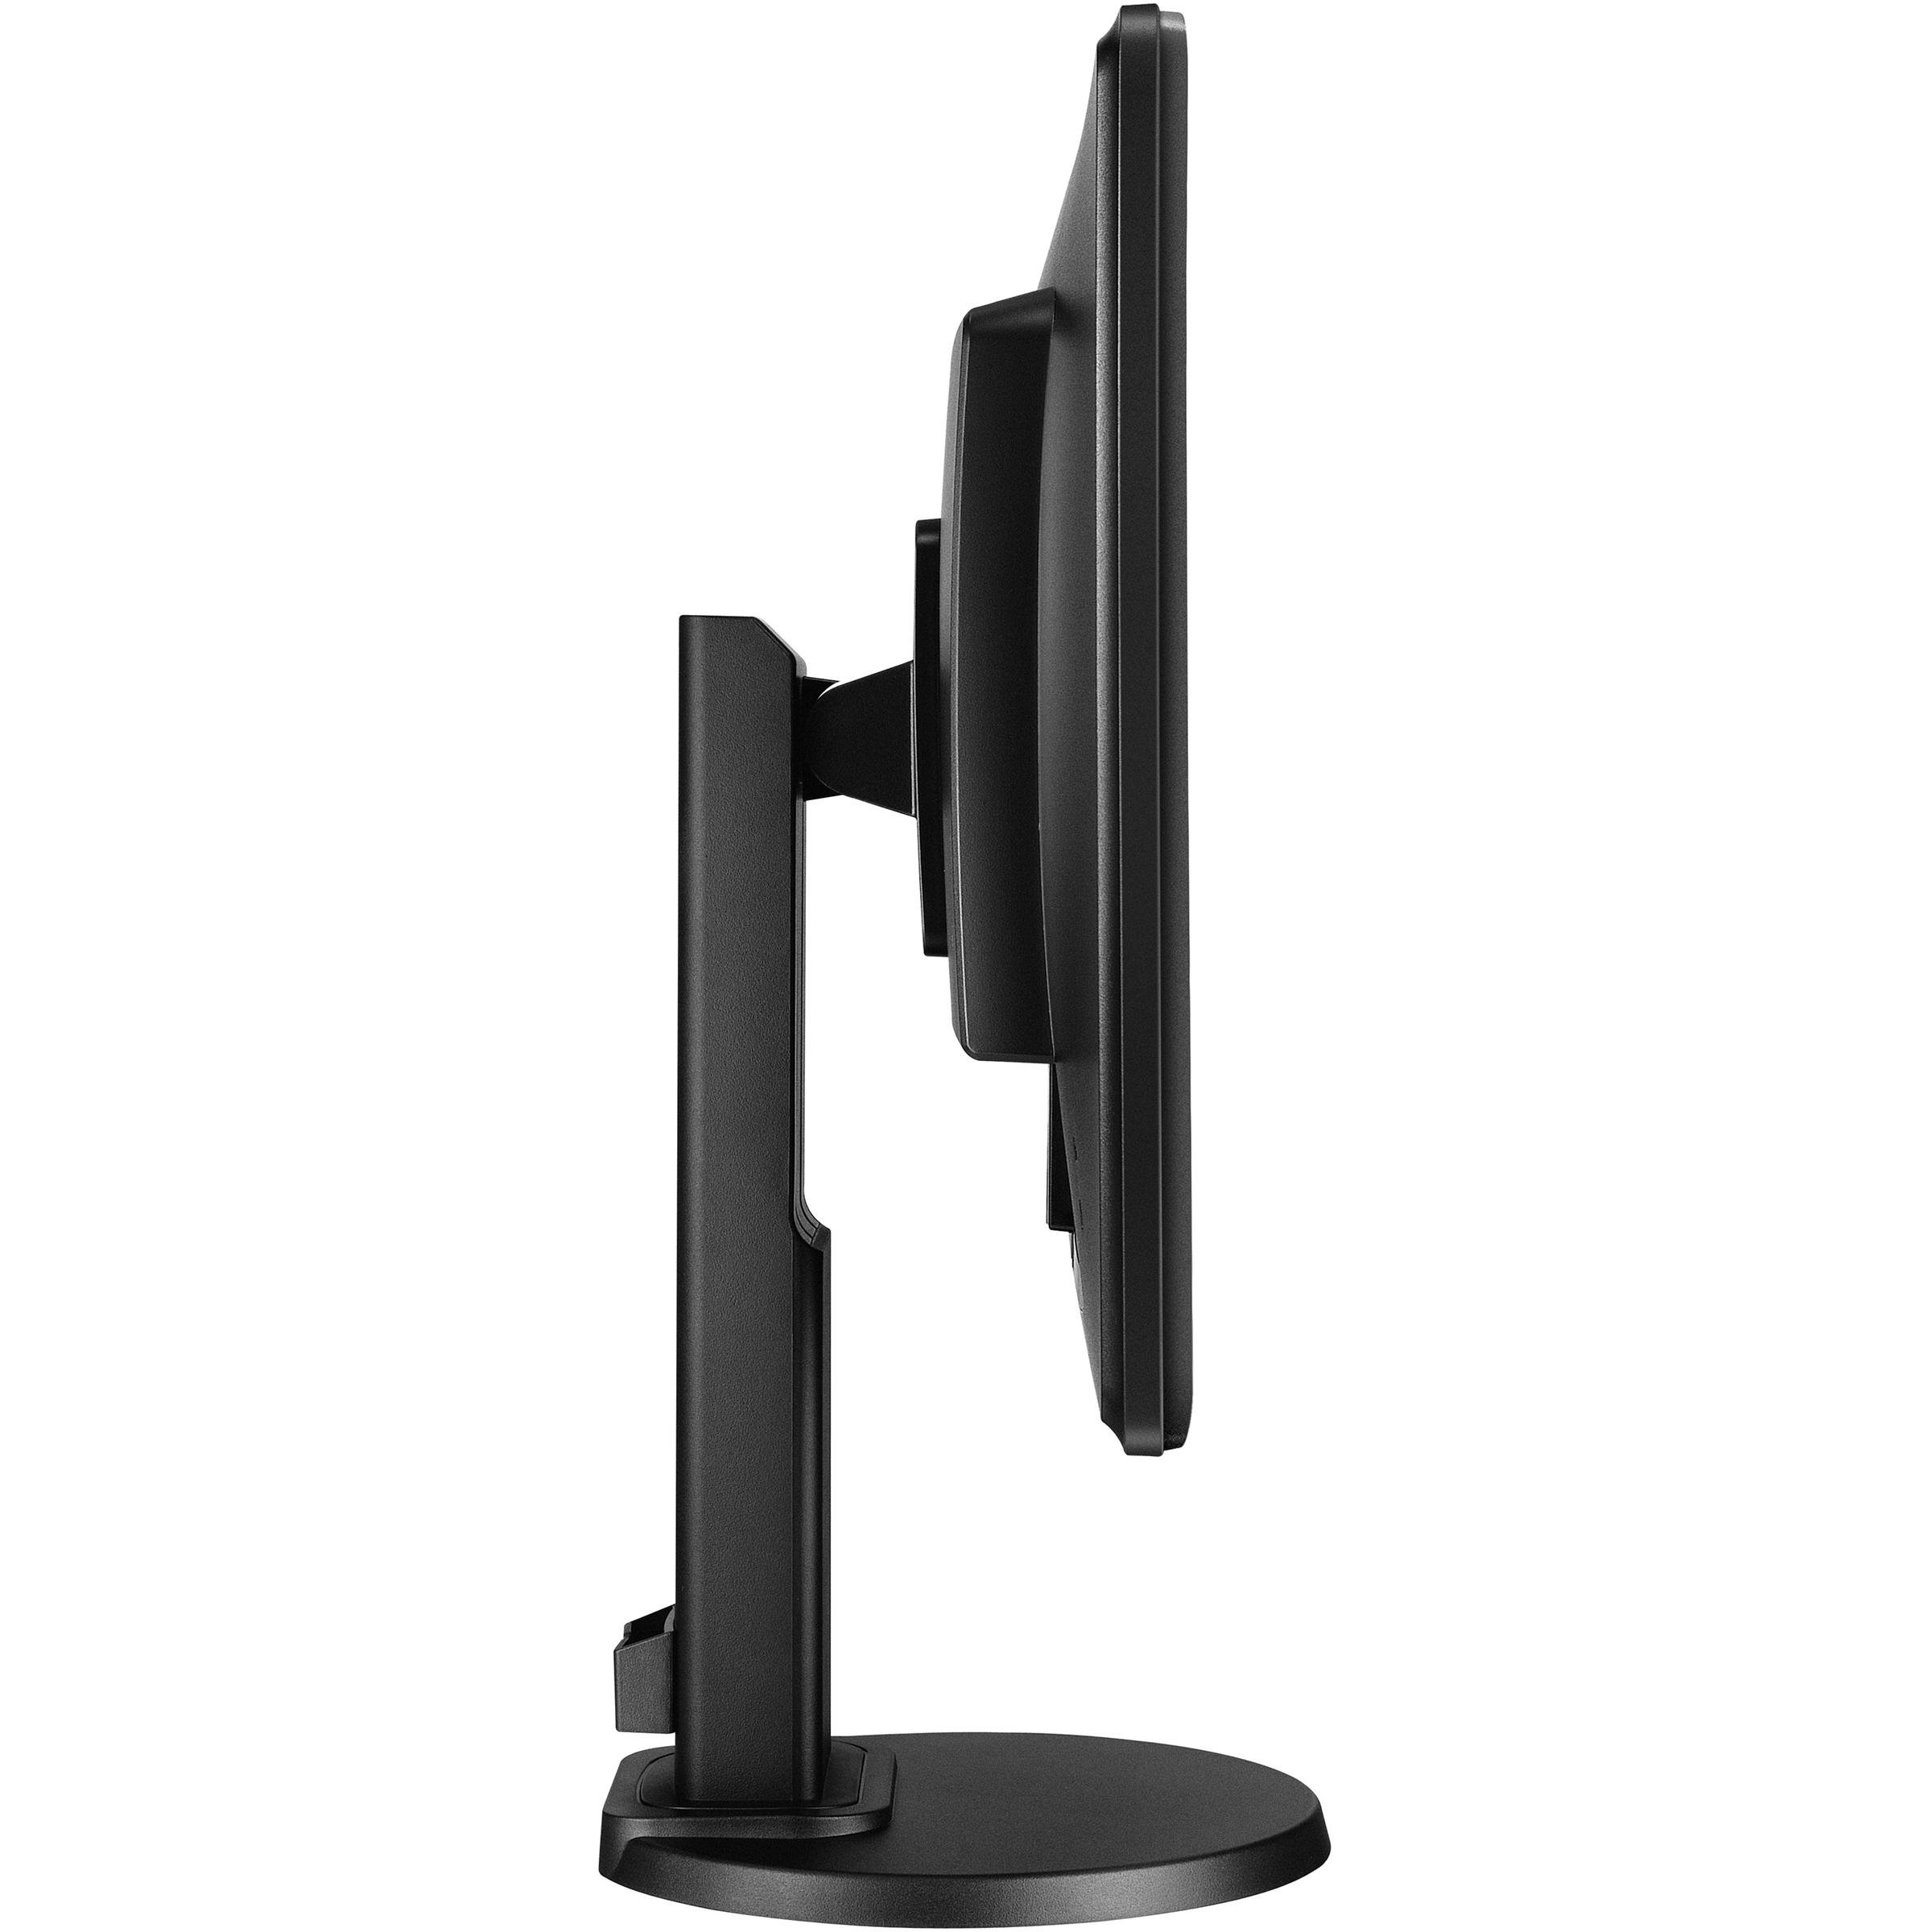 BenQ BL2405HT 61 cm 24inch LED LCD Monitor - 16:9 - 2 ms